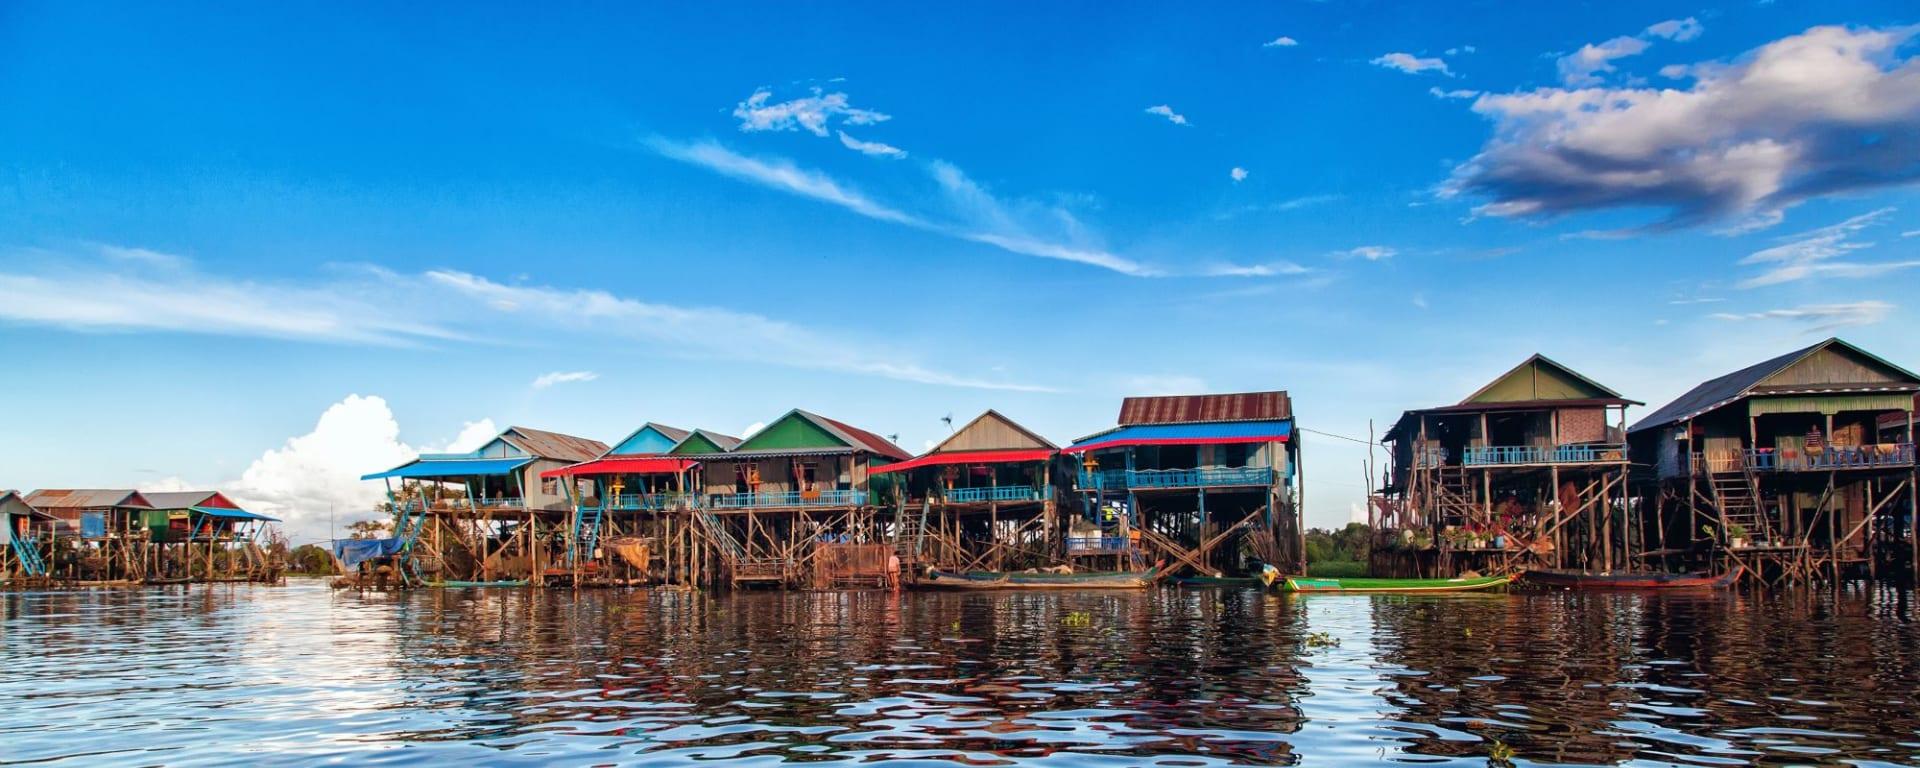 Battambang - le grenier à riz du Cambodge (Siem Reap - Ko Chang): Tonle Sap Floating Village